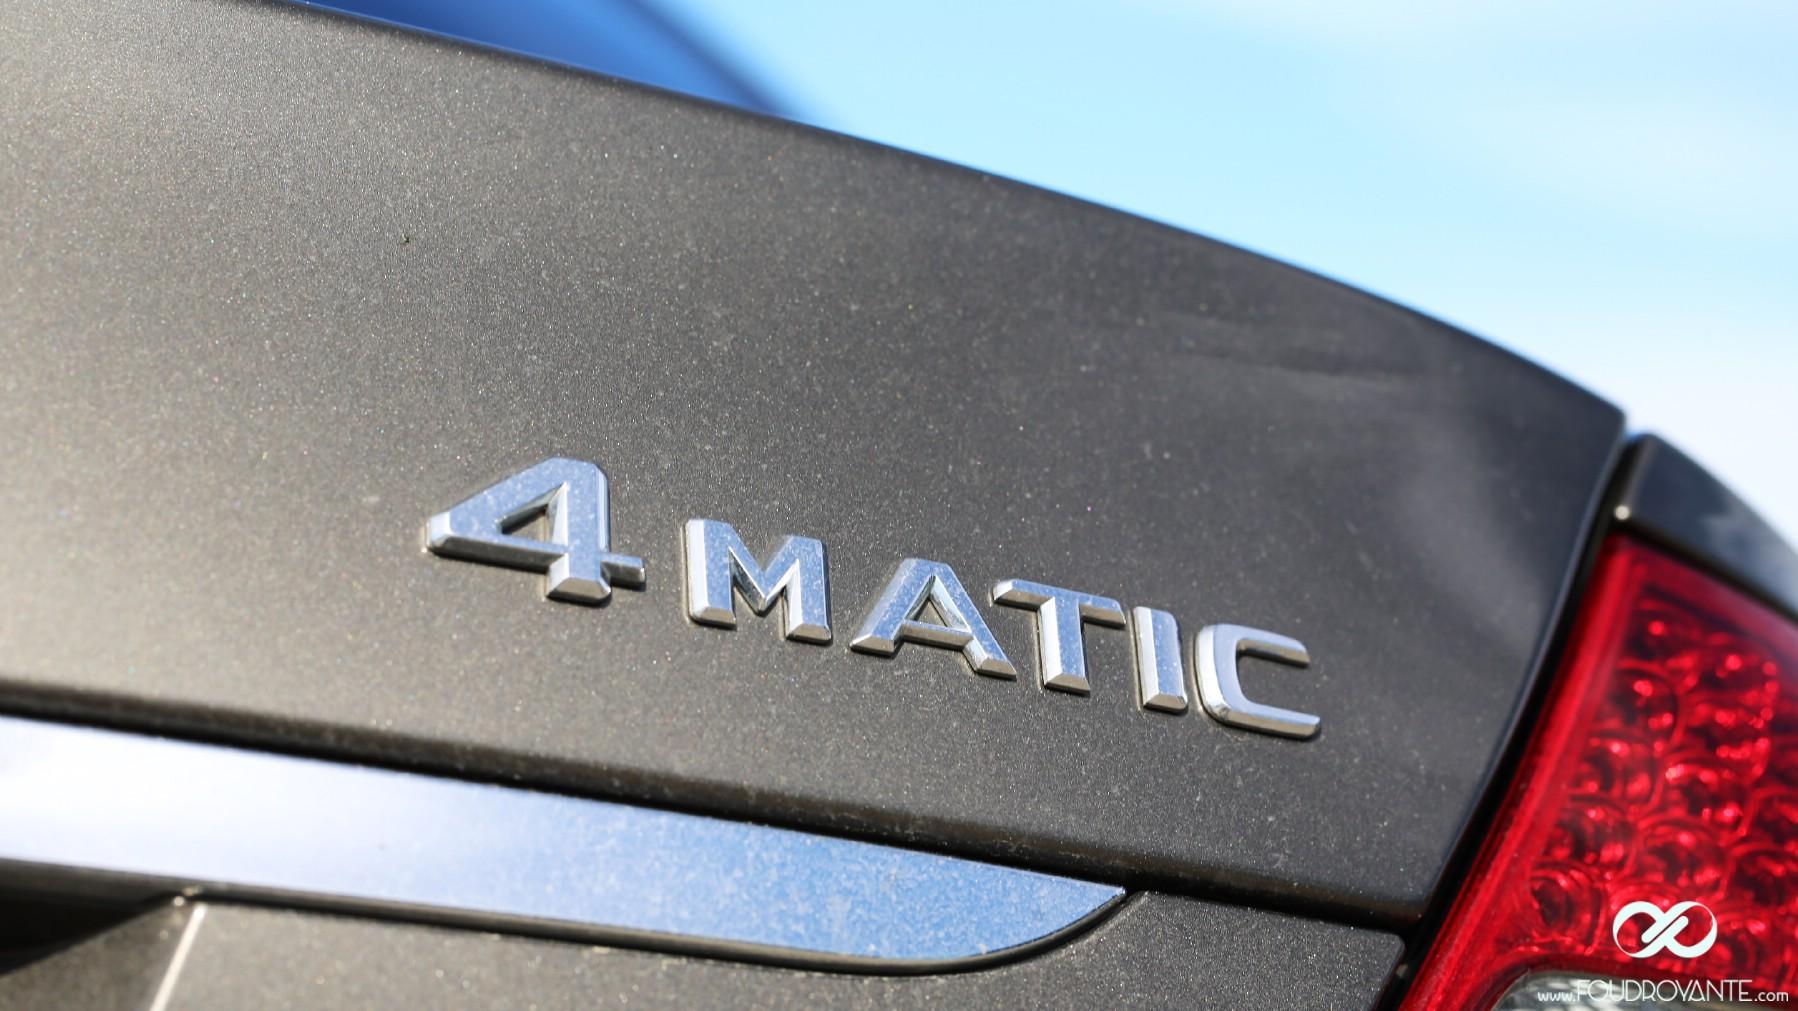 Merco 4Matic